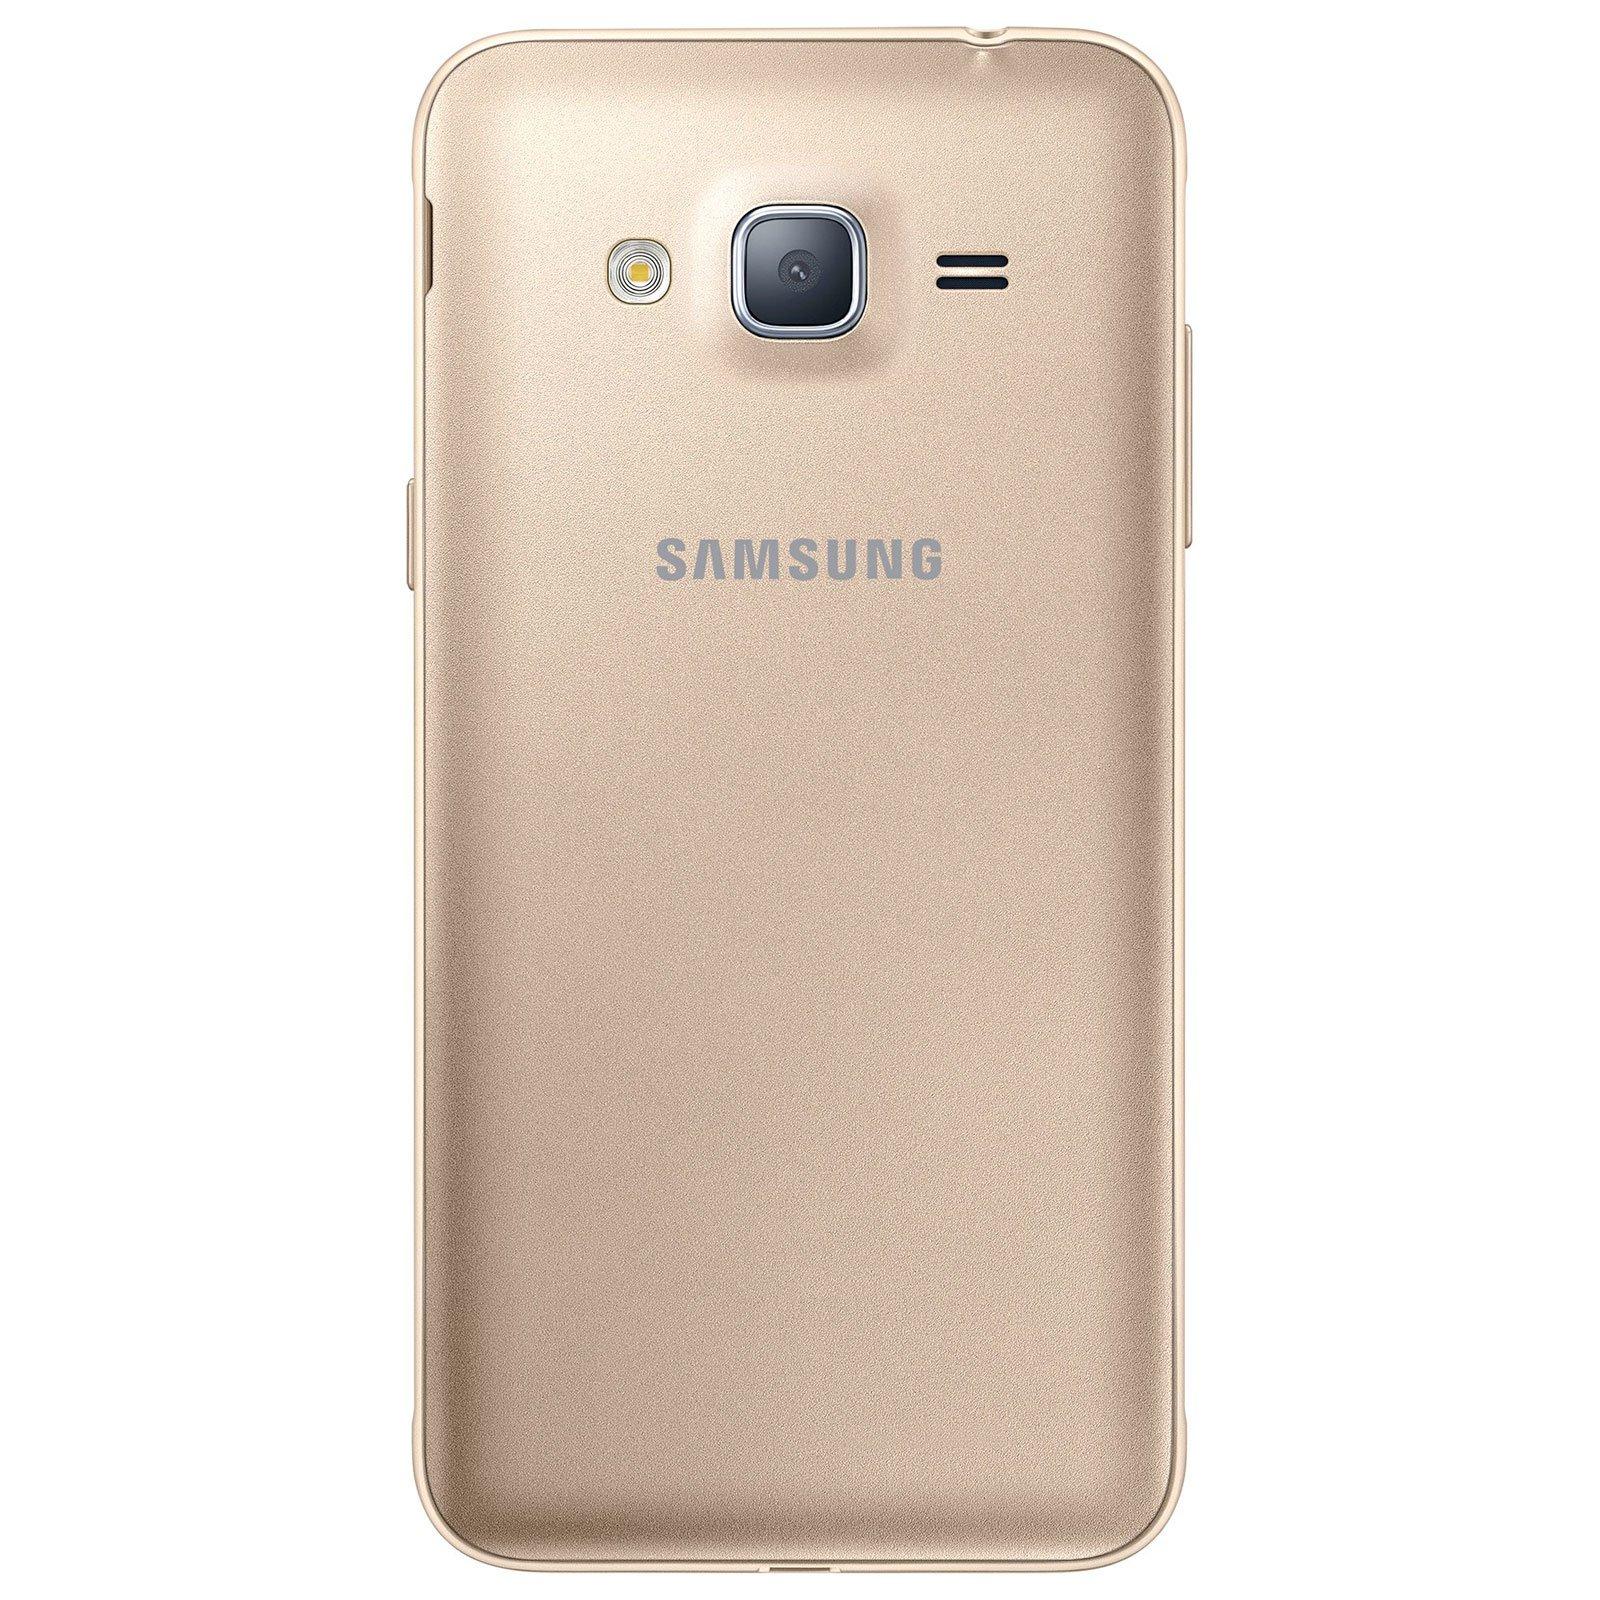 Samsung Galaxy J3 (2016) SM-J320F SIM Doble 4G 8GB Oro: Samsung ...